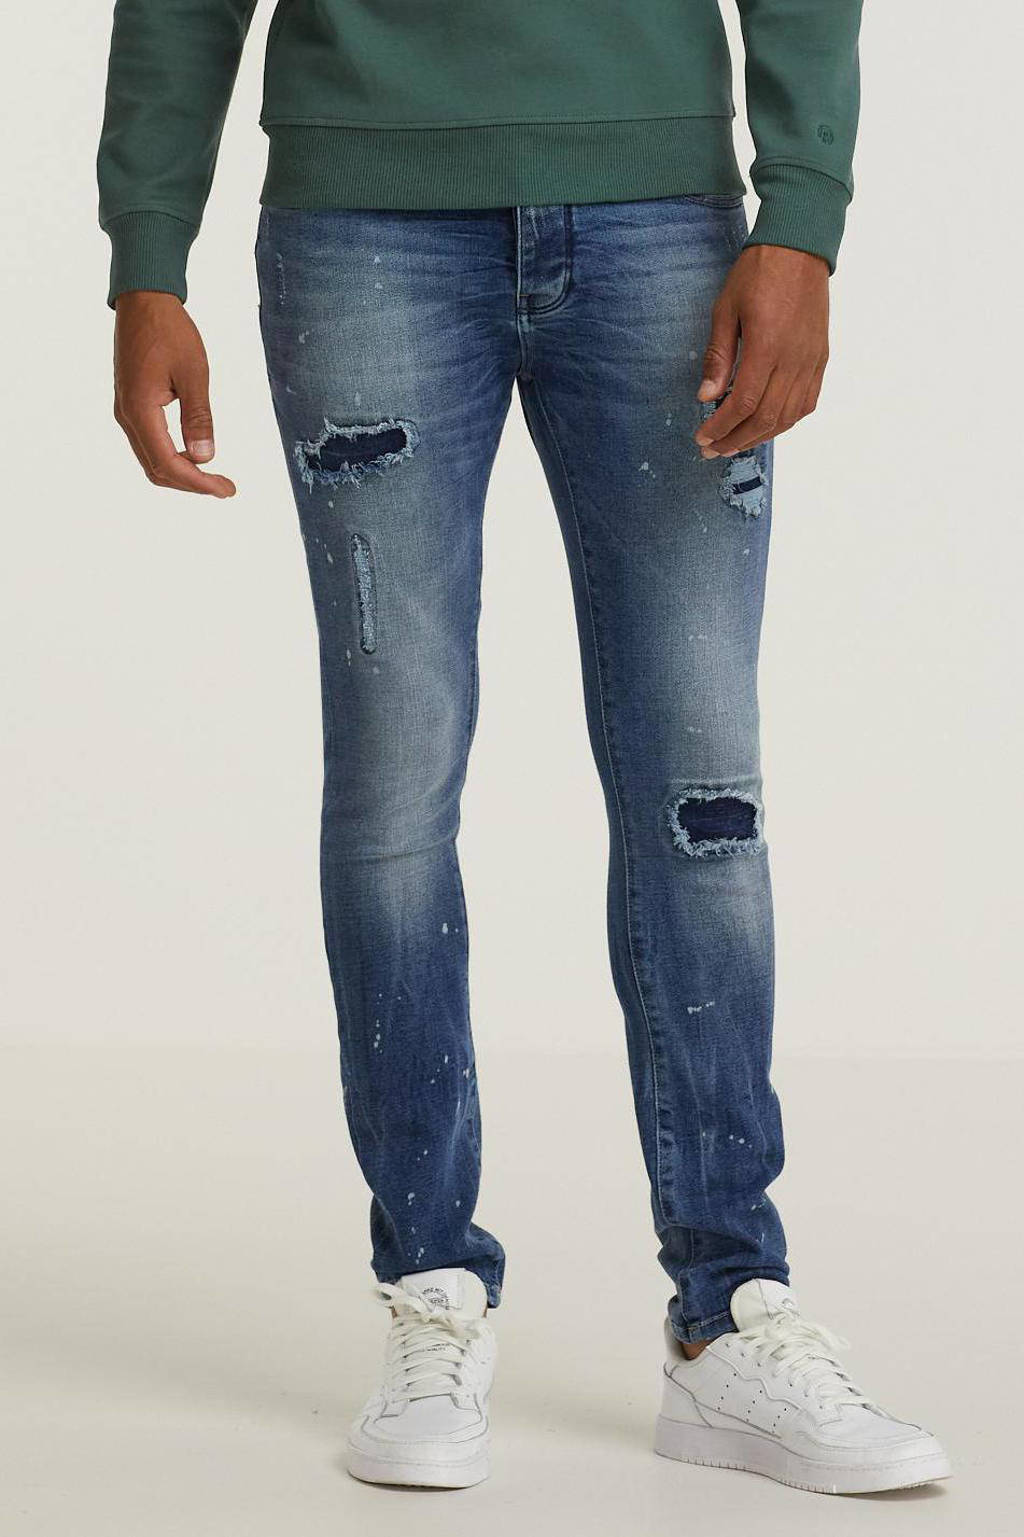 Raizzed super skinny jeans Jungle 02 mid blue stone, 02 Mid Blue Stone